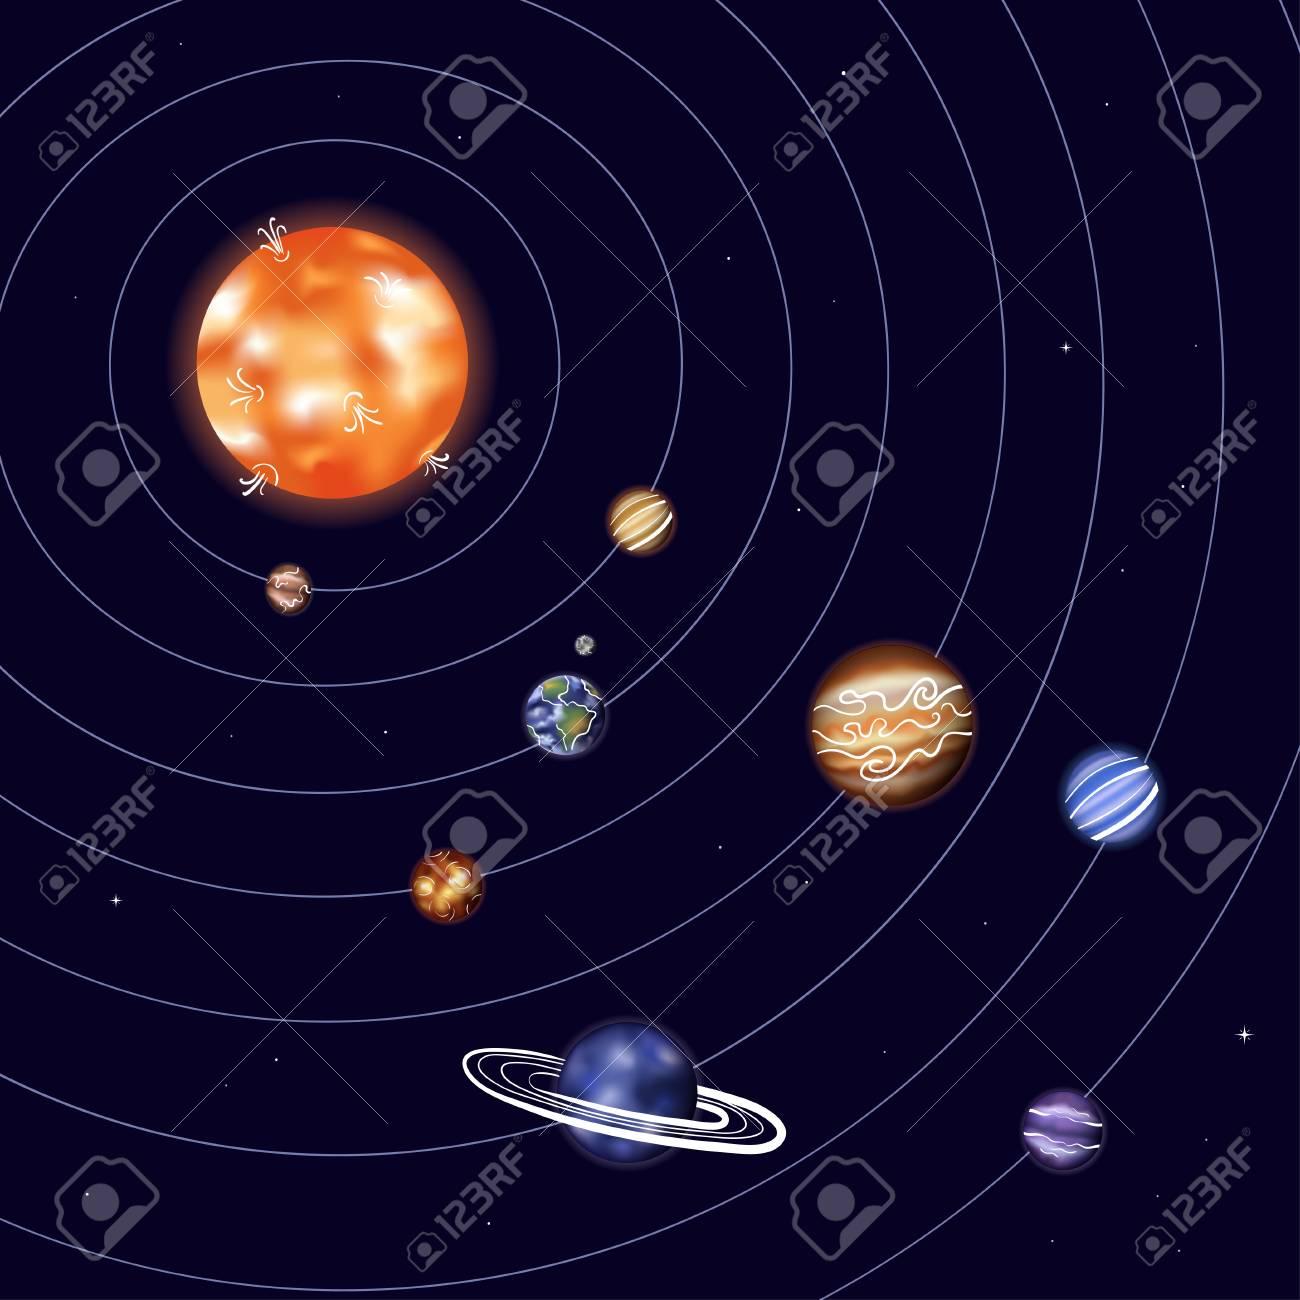 hight resolution of vector vector illustration of solar system with sun mercury venus earth moon mars jupiter saturn uranus neptune diagram with order of planet